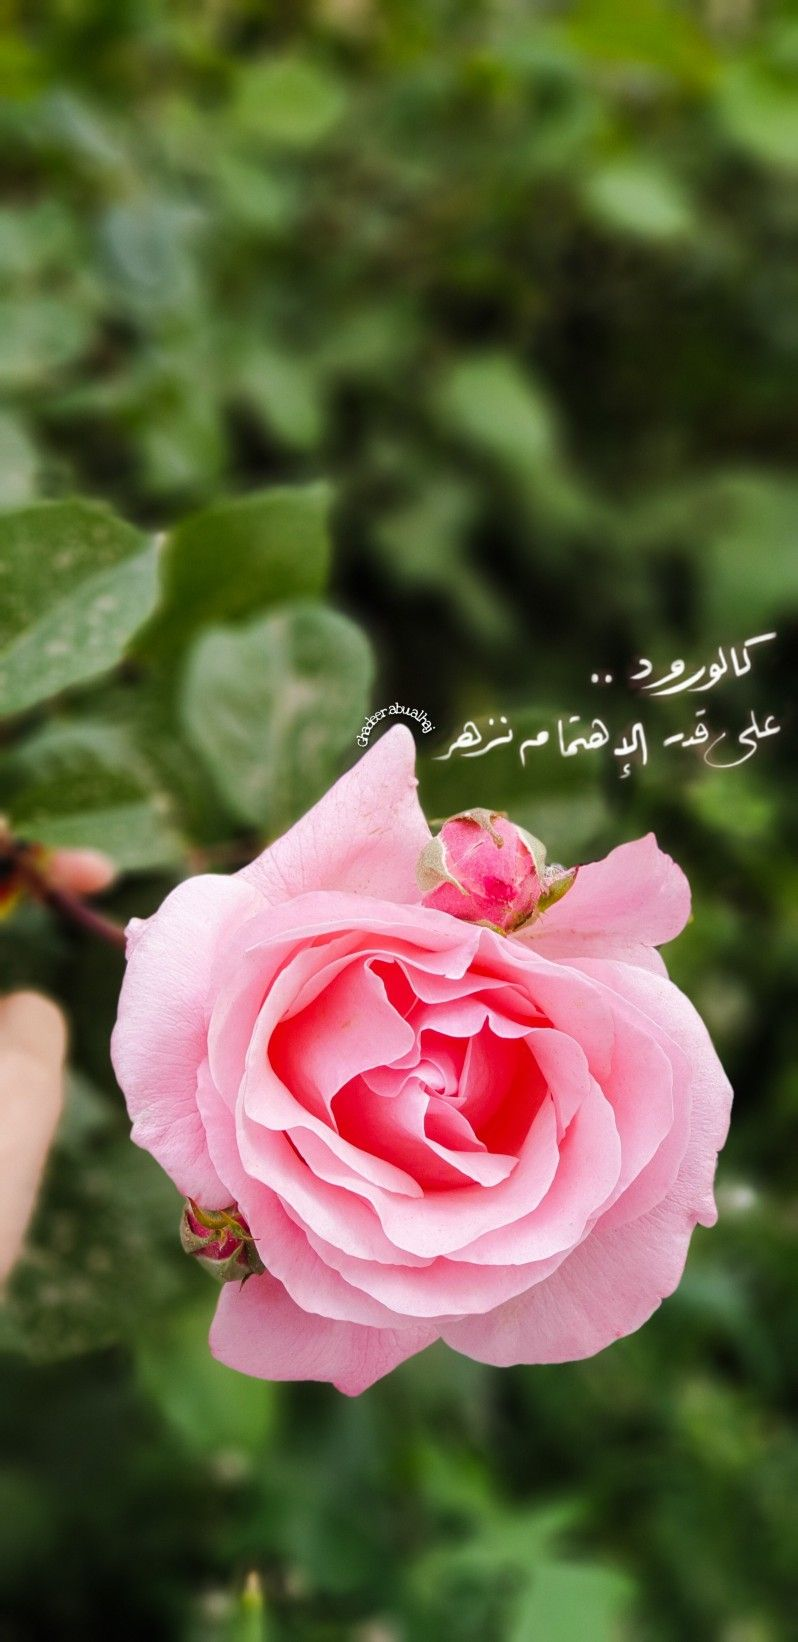 ورد اقتباسات كلام زهري مصورات خلفيات بيسيات Flower Box Gift Sky Photography Nature Anatomy Art